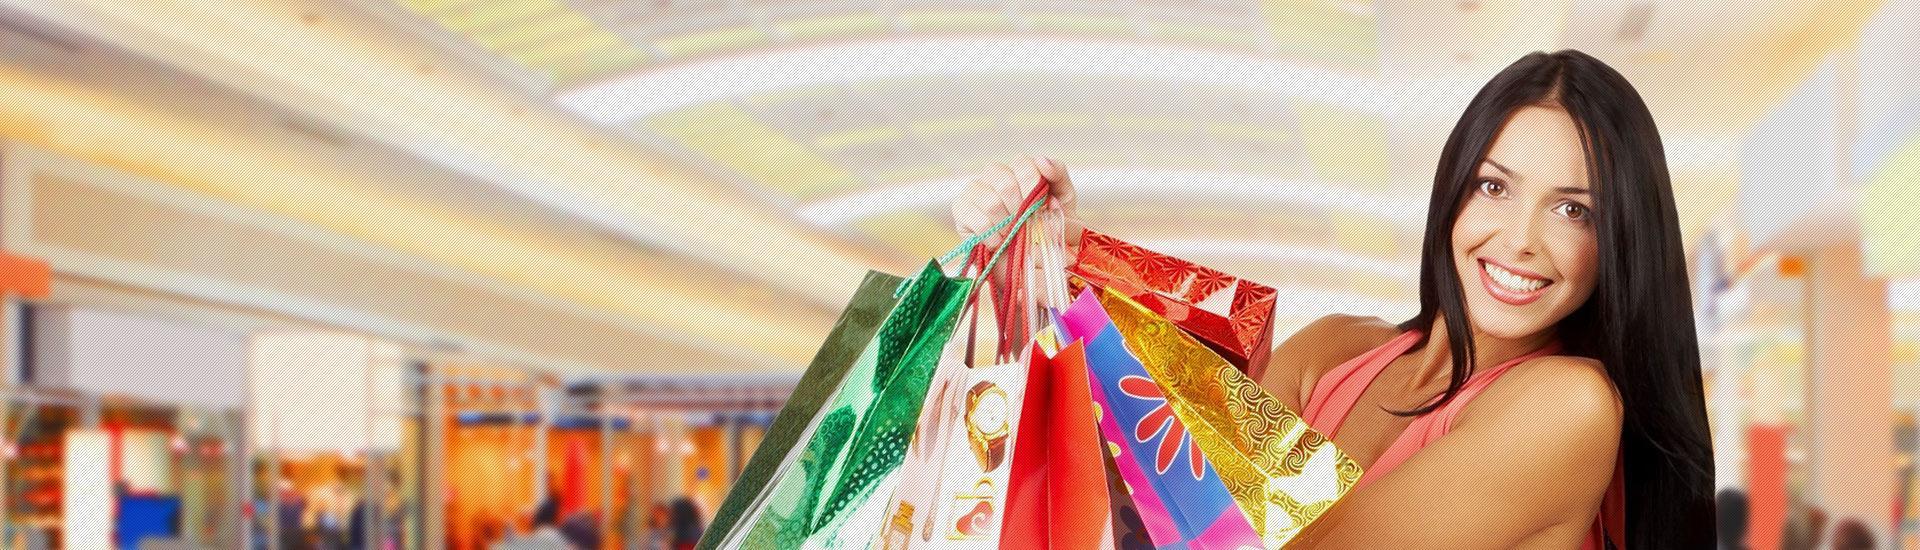 Tax Free Germany - Shoppen mit Leidenschaft